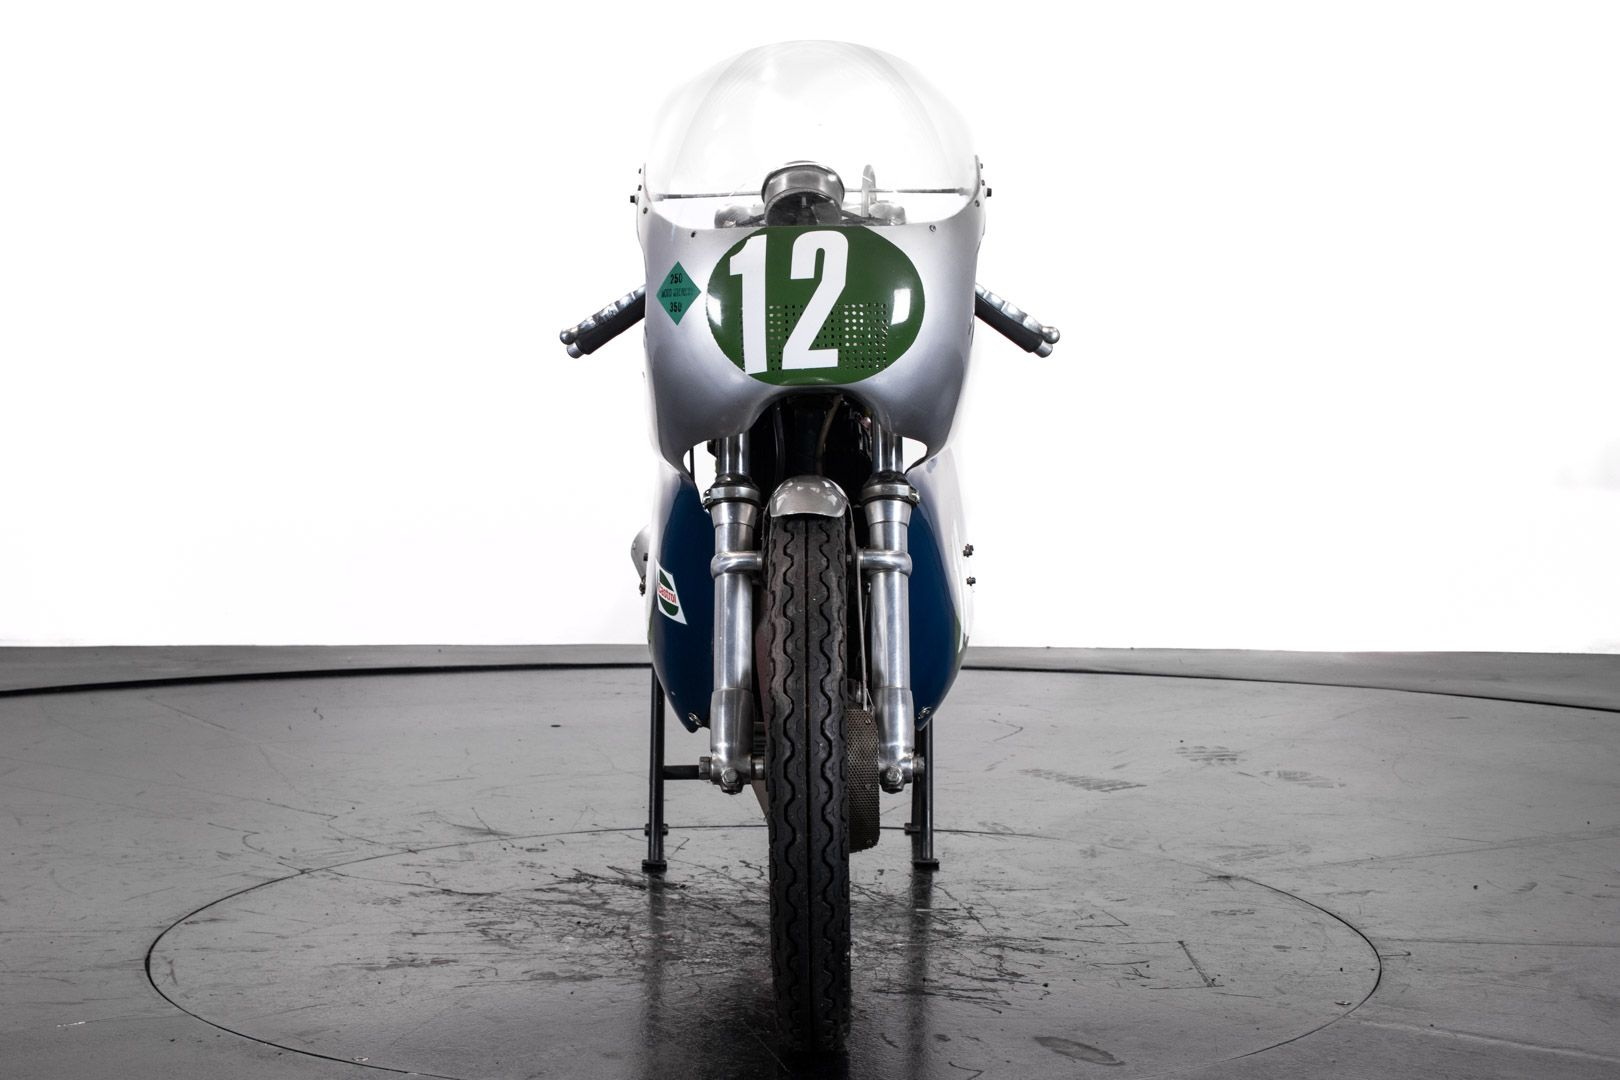 1960 Ducati Mach 1 Corsa NCR 82191